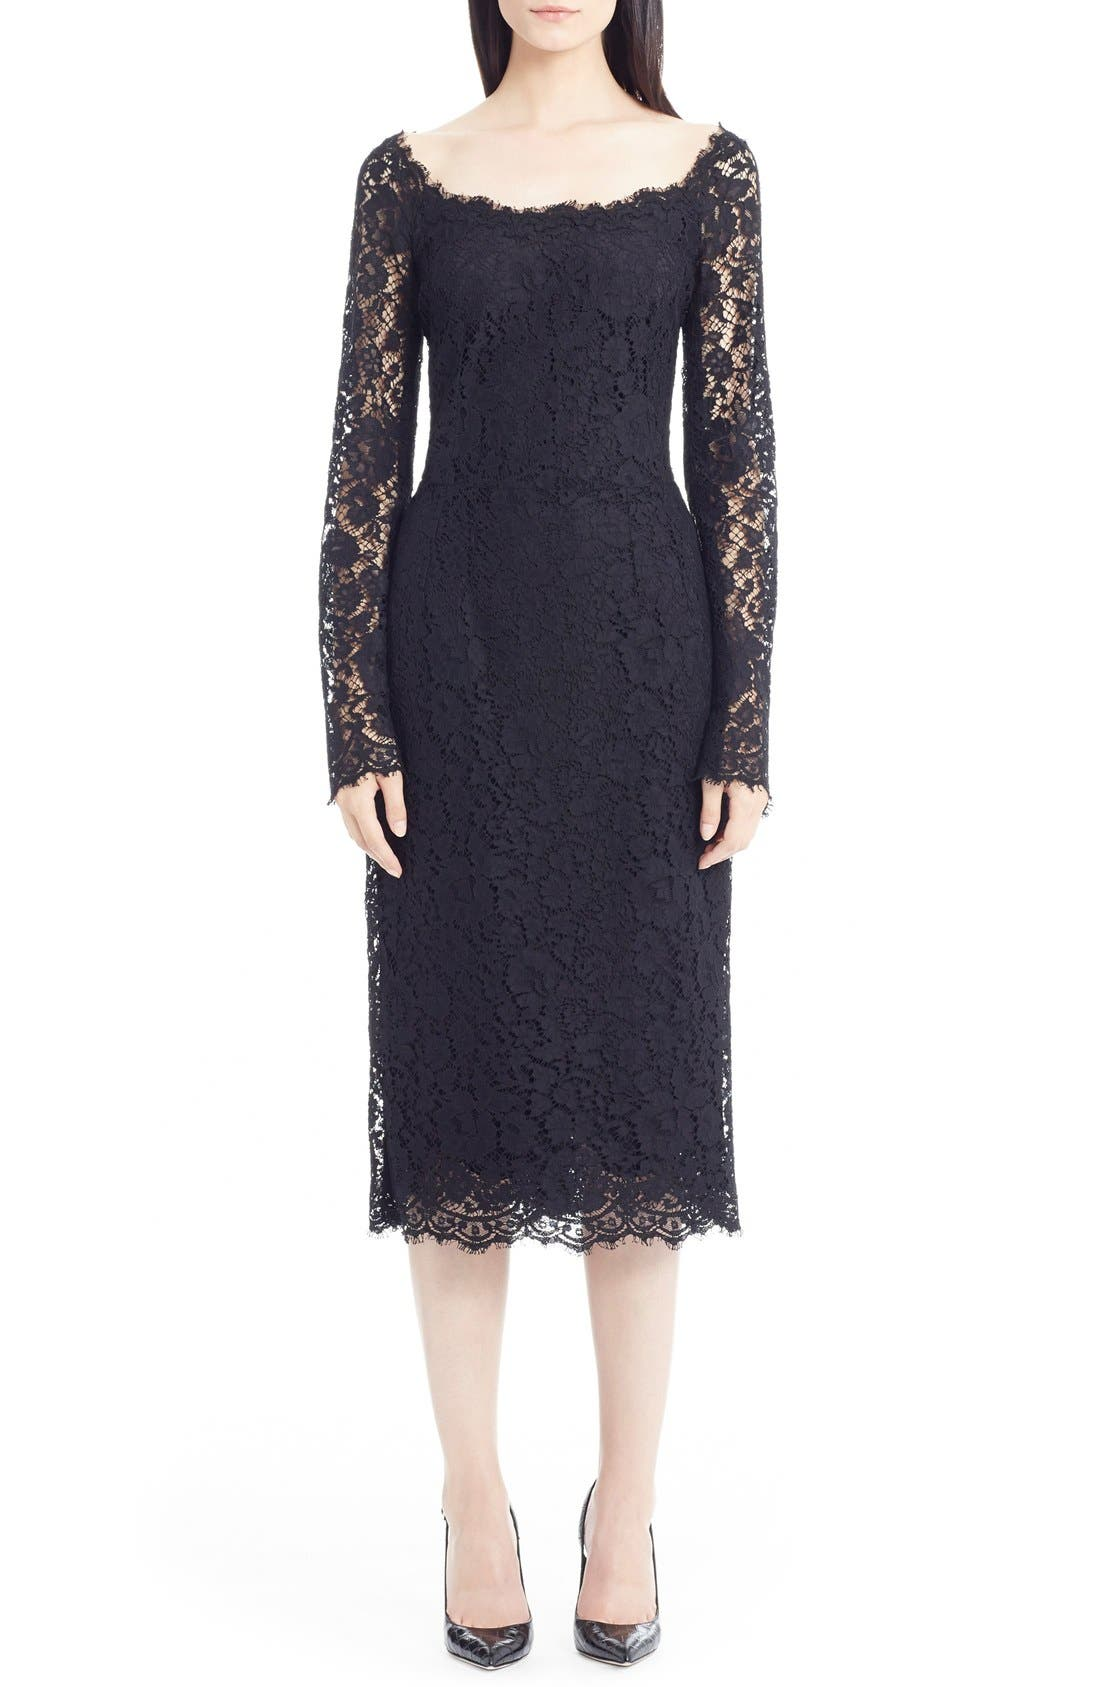 Main Image - Dolce&Gabbana Scoop Neck Lace Dress